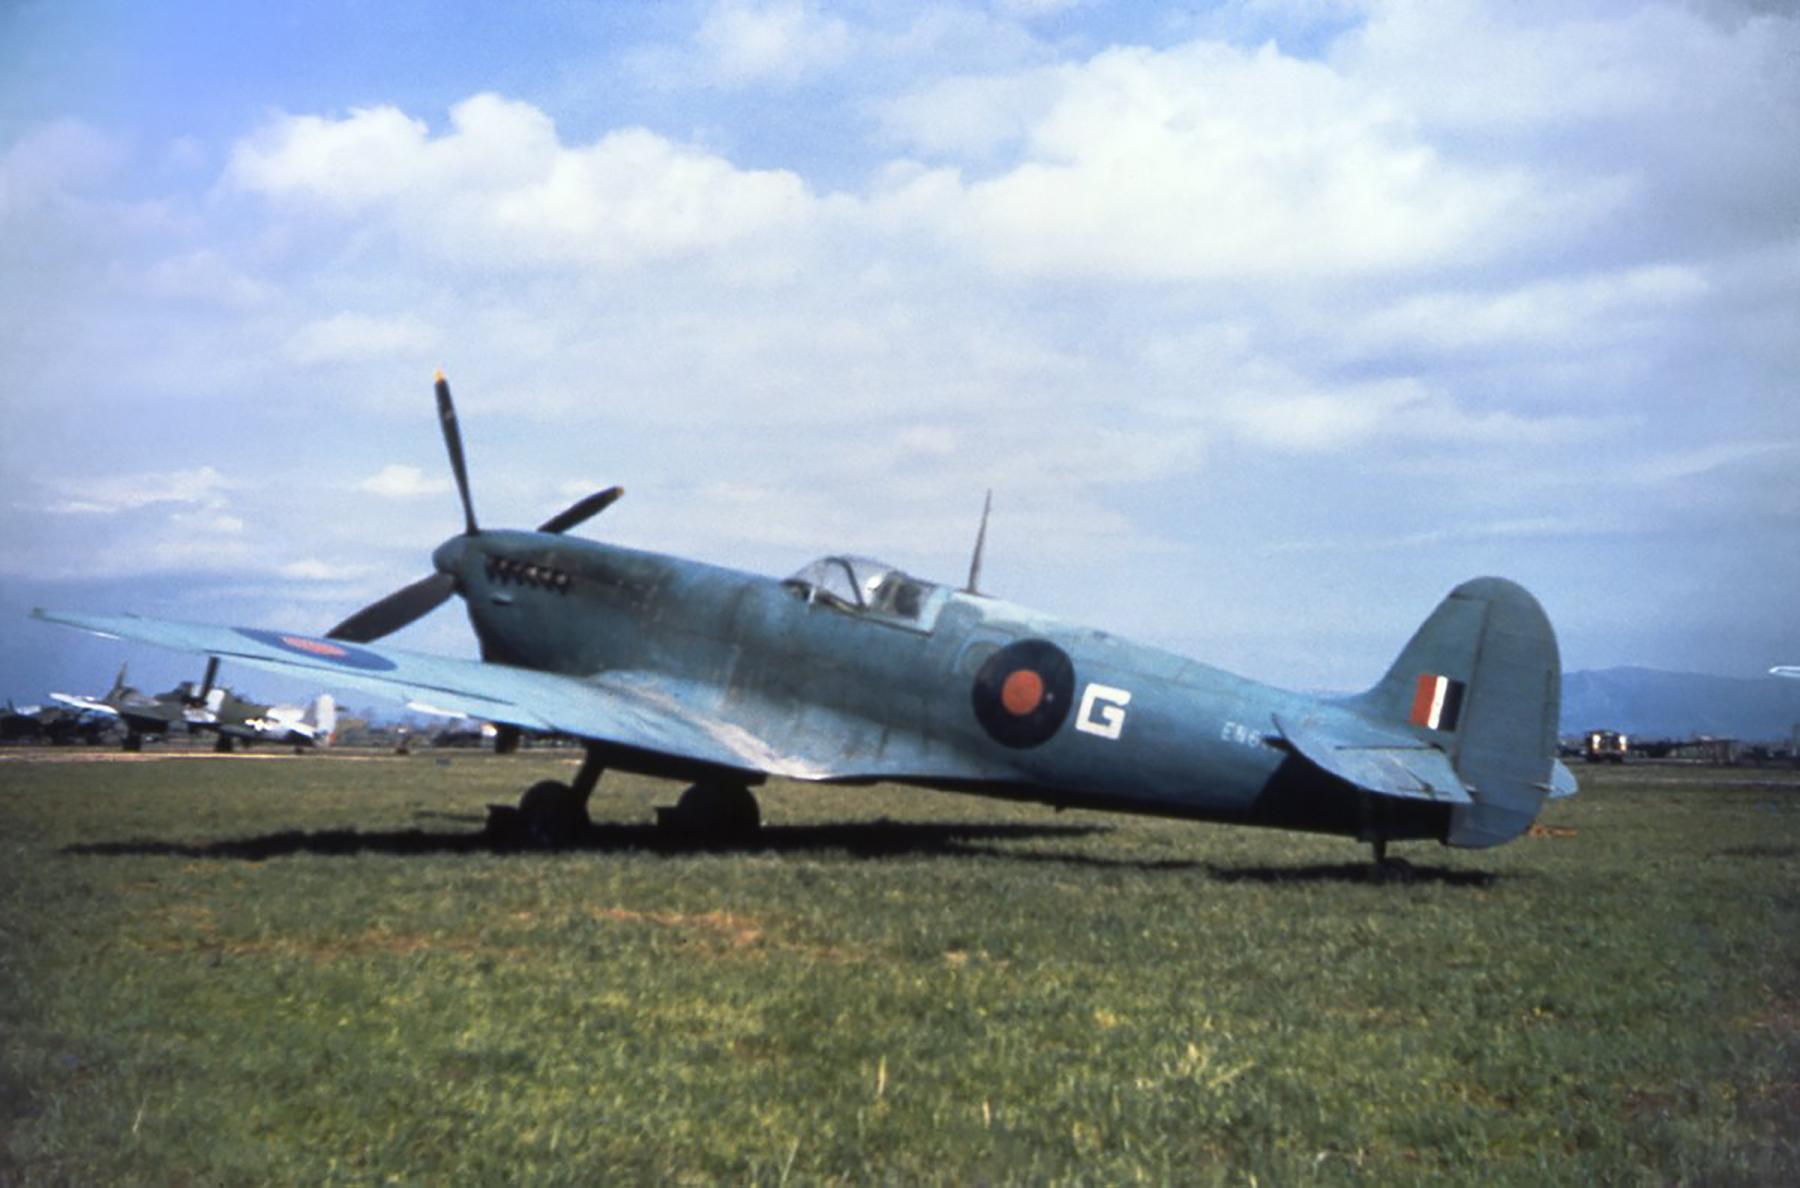 Spitfire PRXI RAF Benson G 01